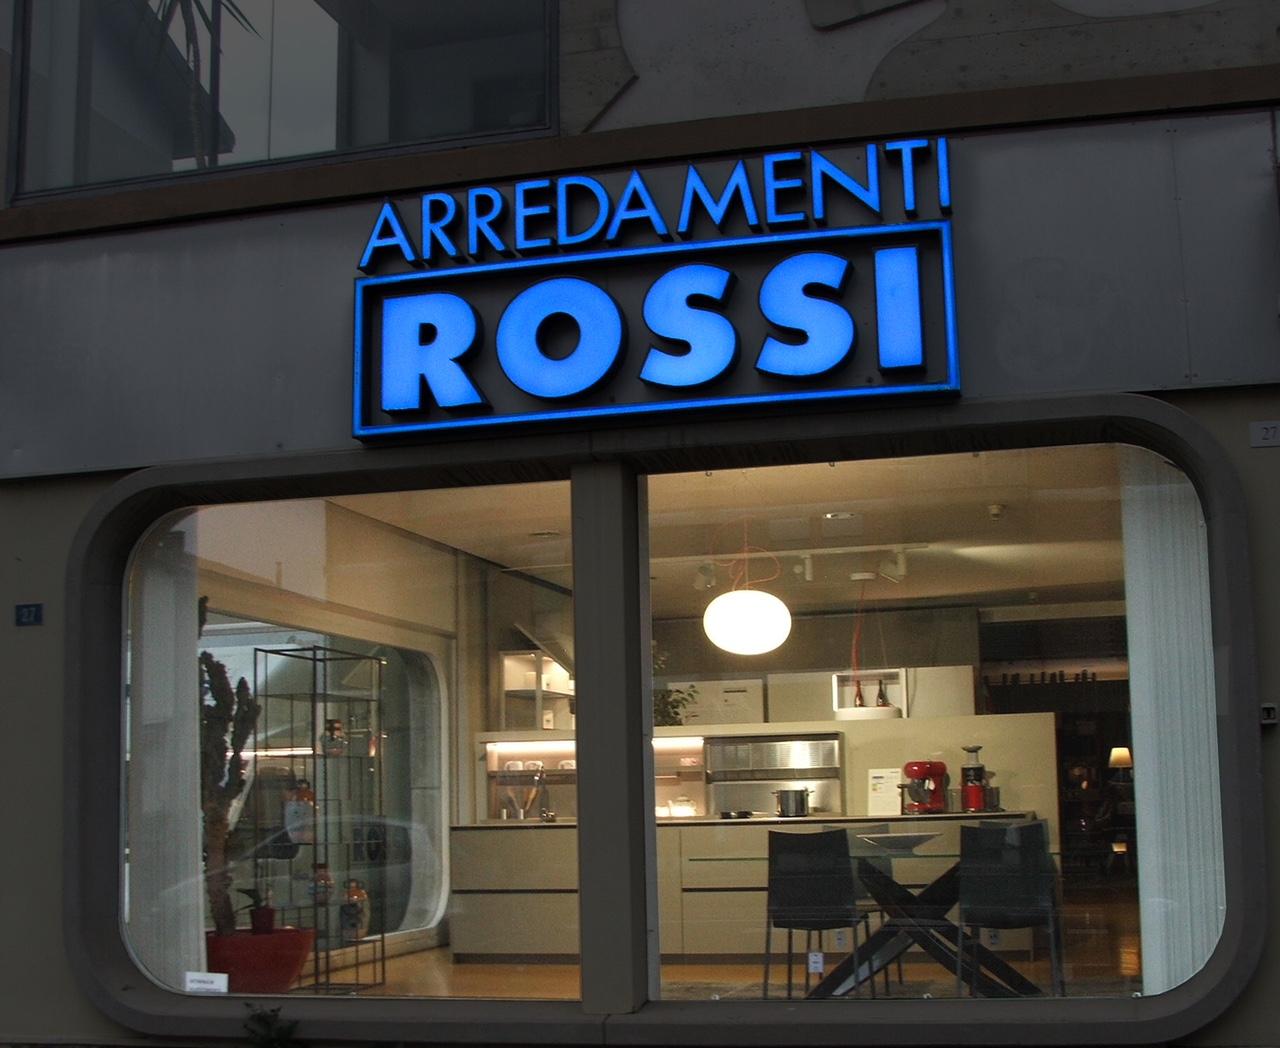 Arredamenti rossi schio vicenza payshop payshop for Rossi arredamenti